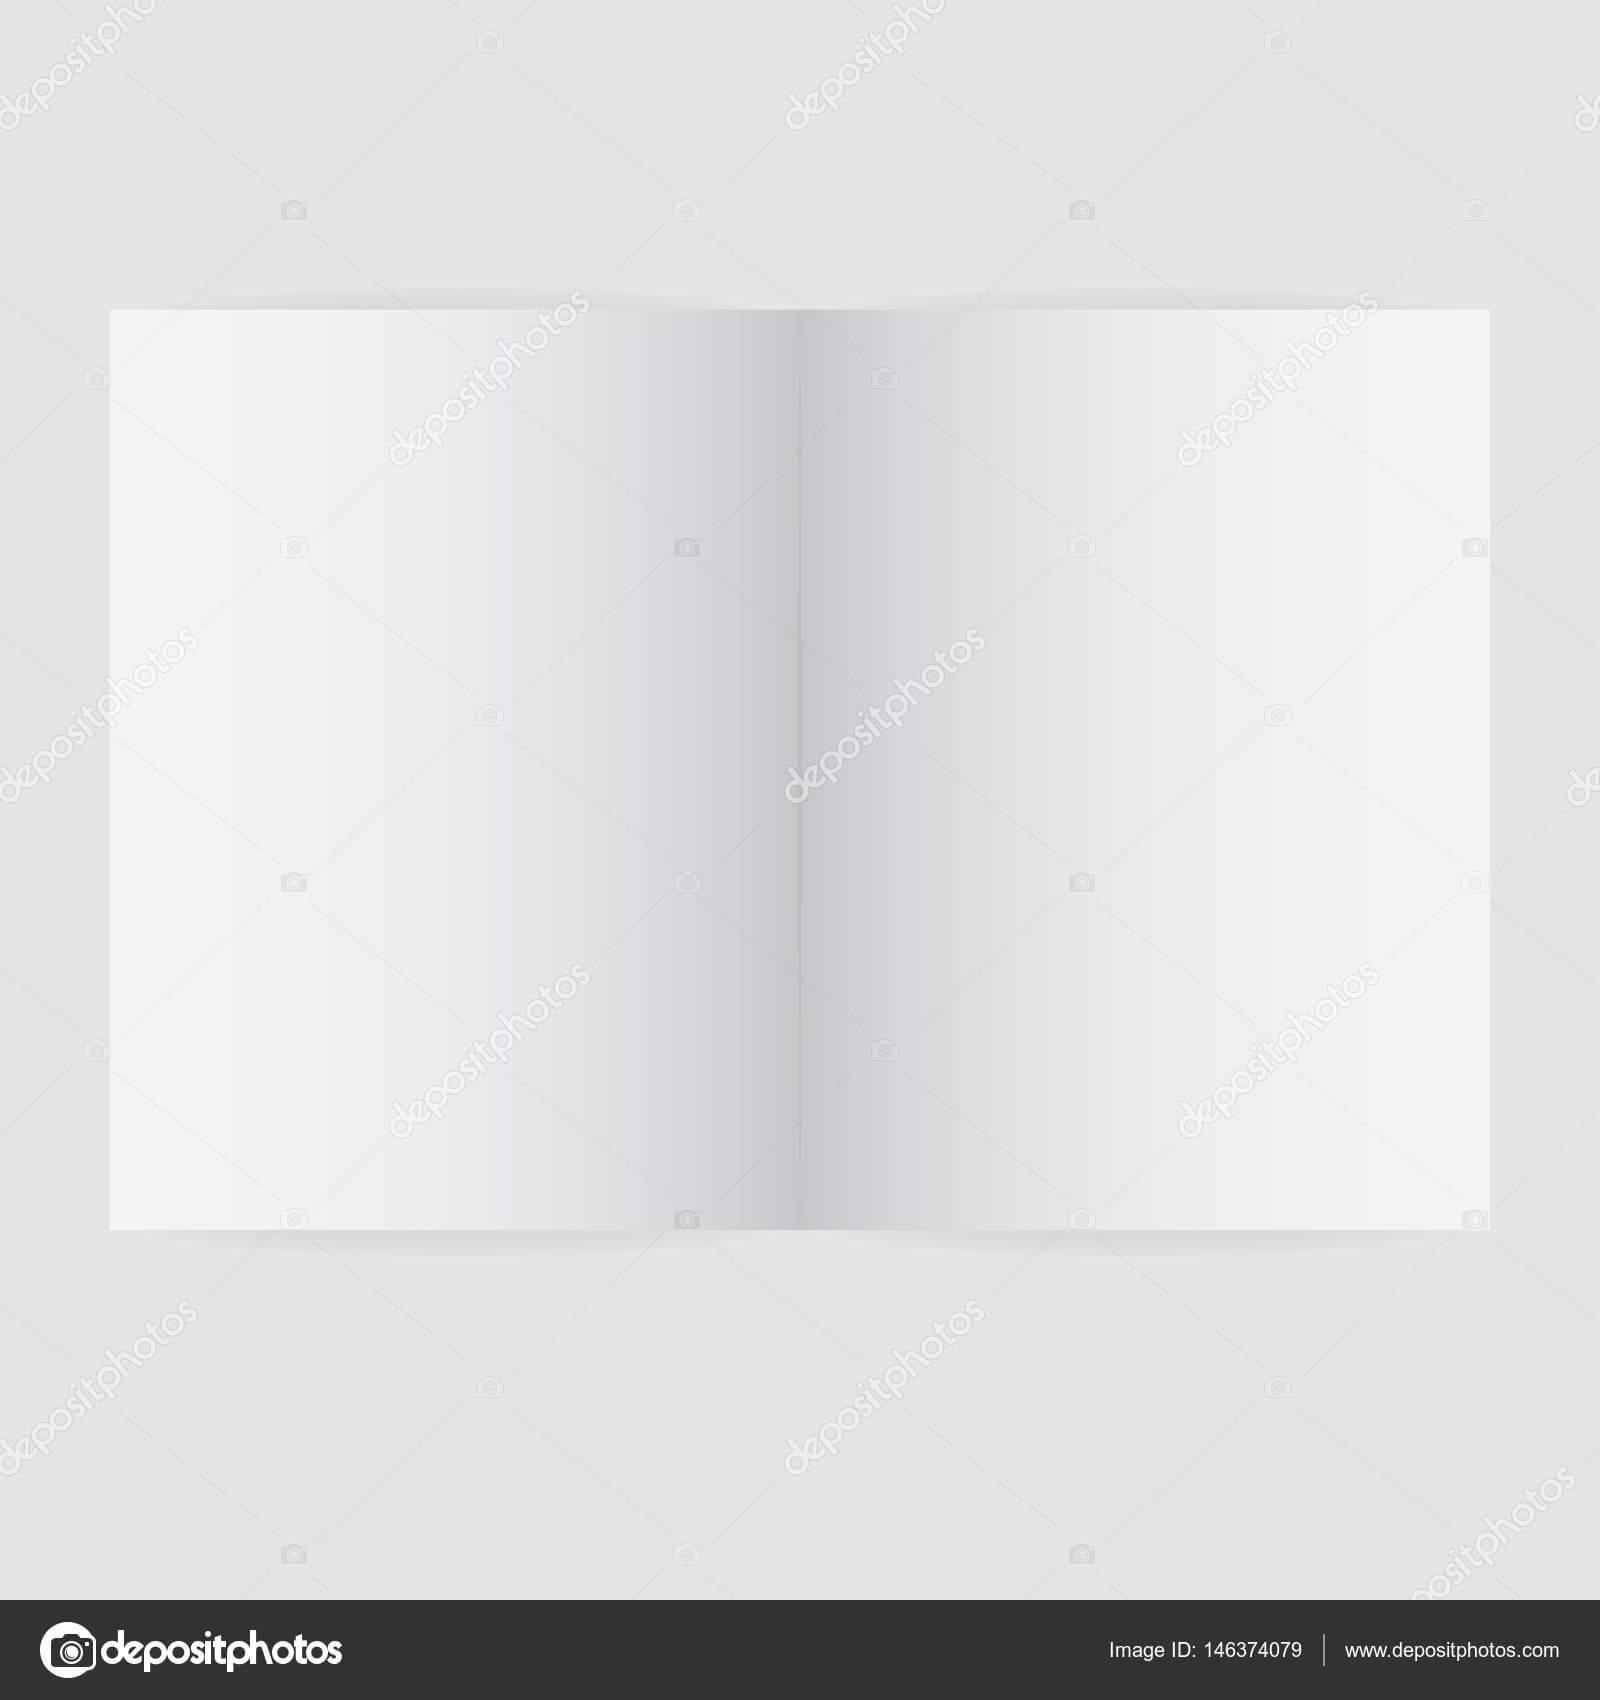 Blank Magazine Spread Template | Blank Magazine Spread regarding Blank Magazine Spread Template